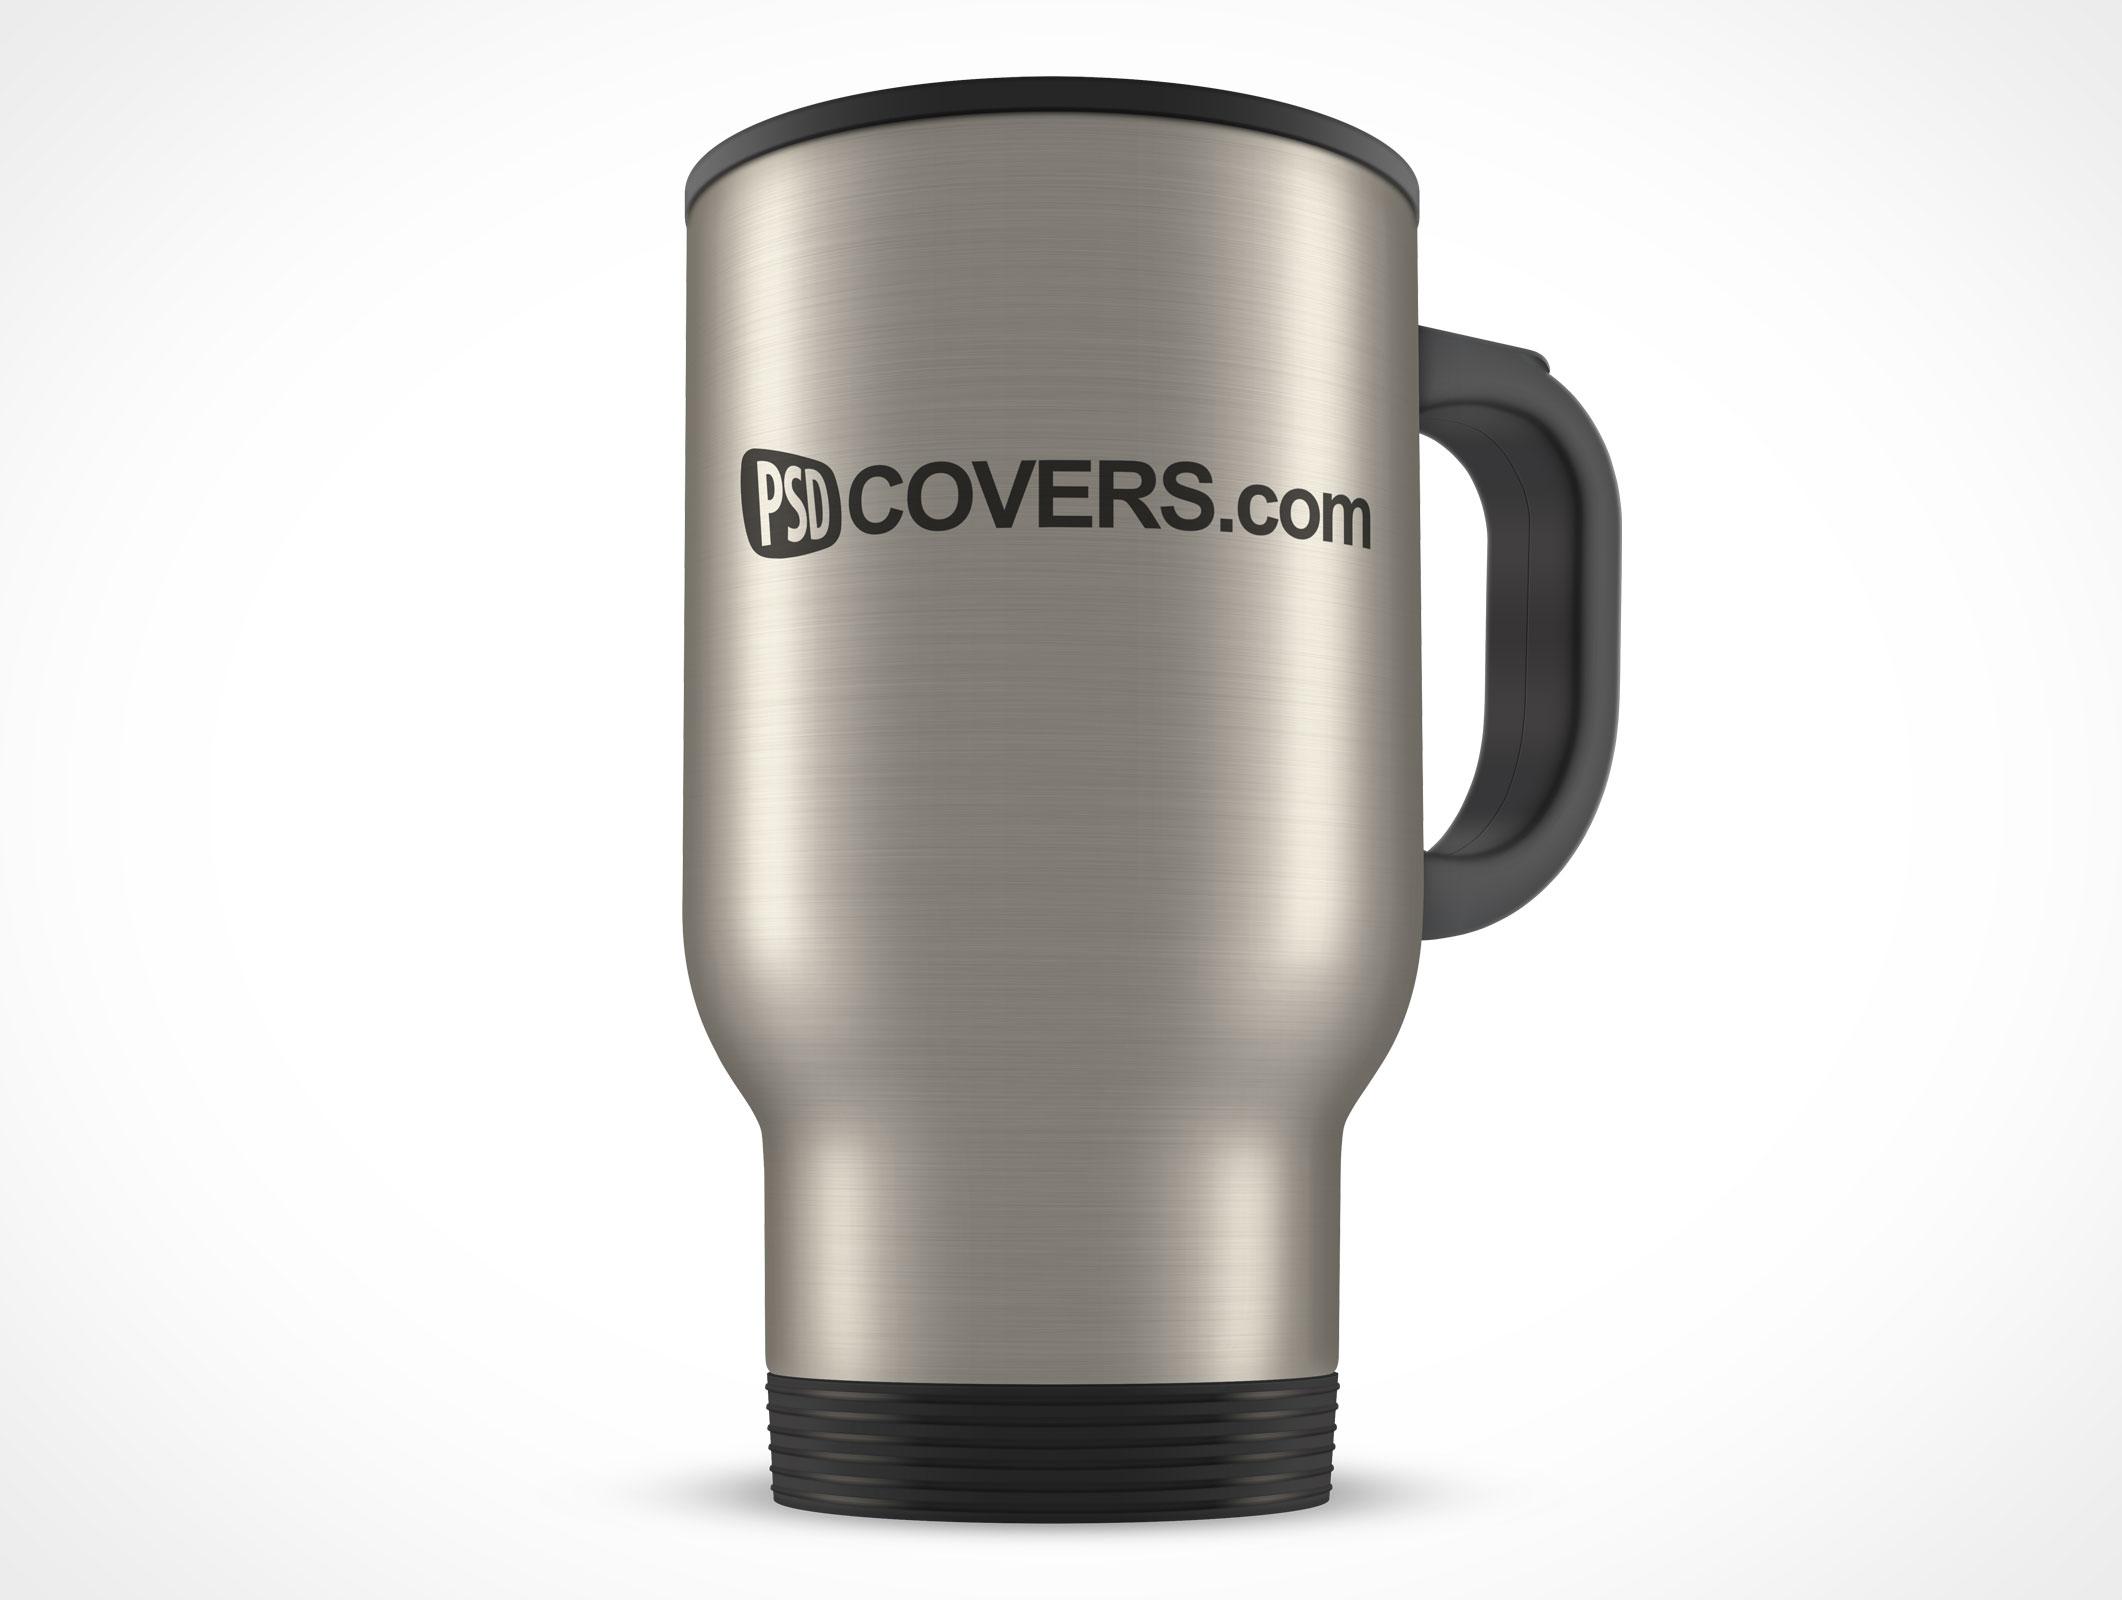 Designer Coffee Mugs 11 Cool Coffee Mugs And Tea Cups